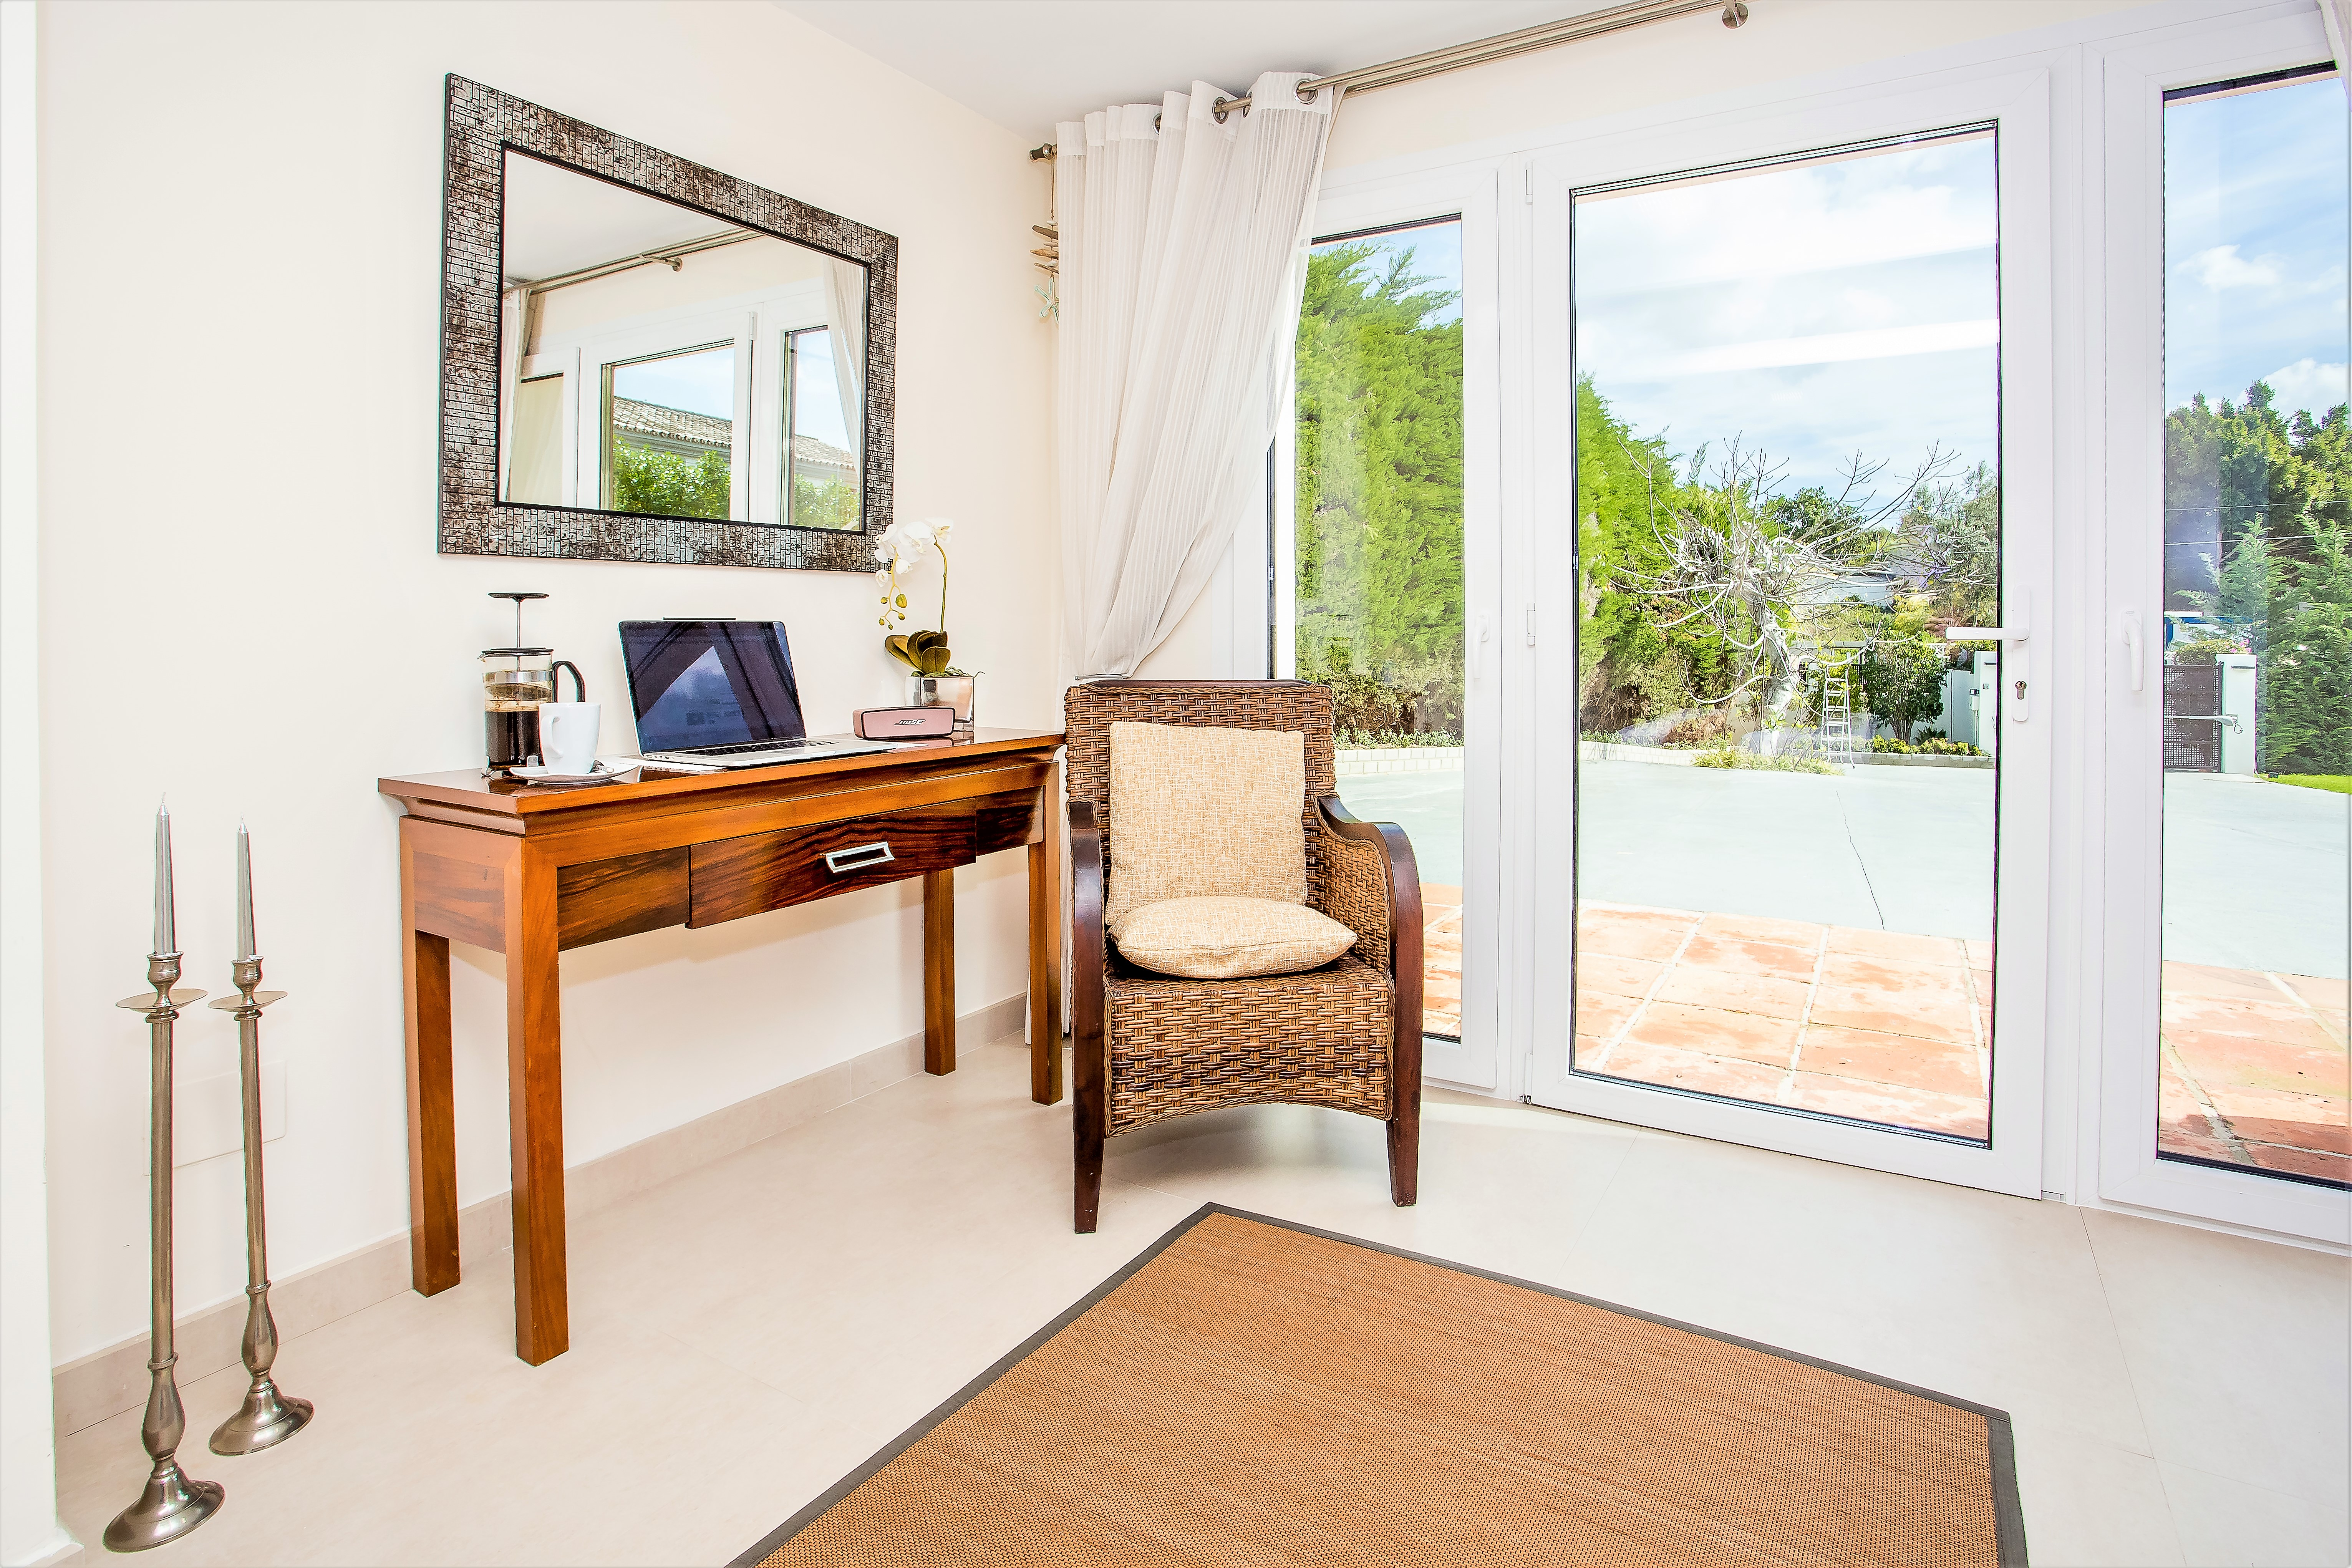 Apartment 8 Bedroom VILLA BY PUERTO BANUS   SEA 5 min                                photo 16821784